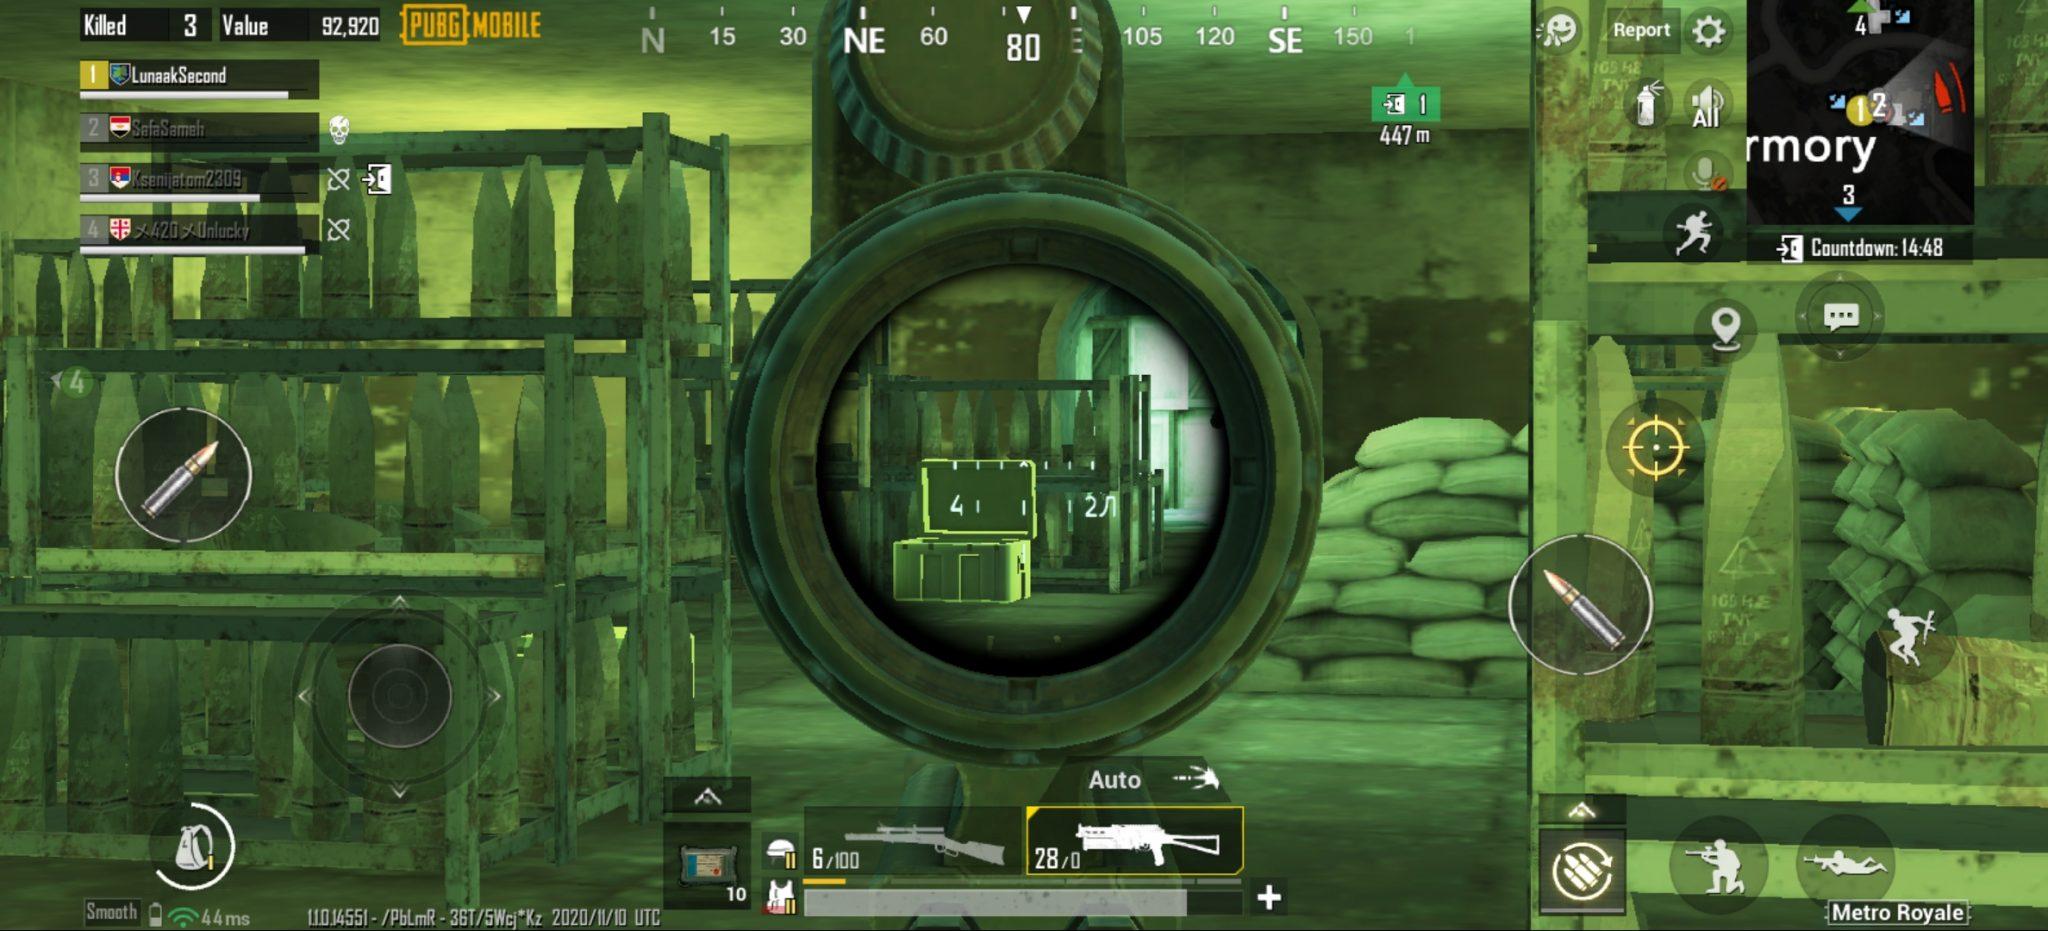 Contoh gameplay mode PUBG Mobile Metro Royale.